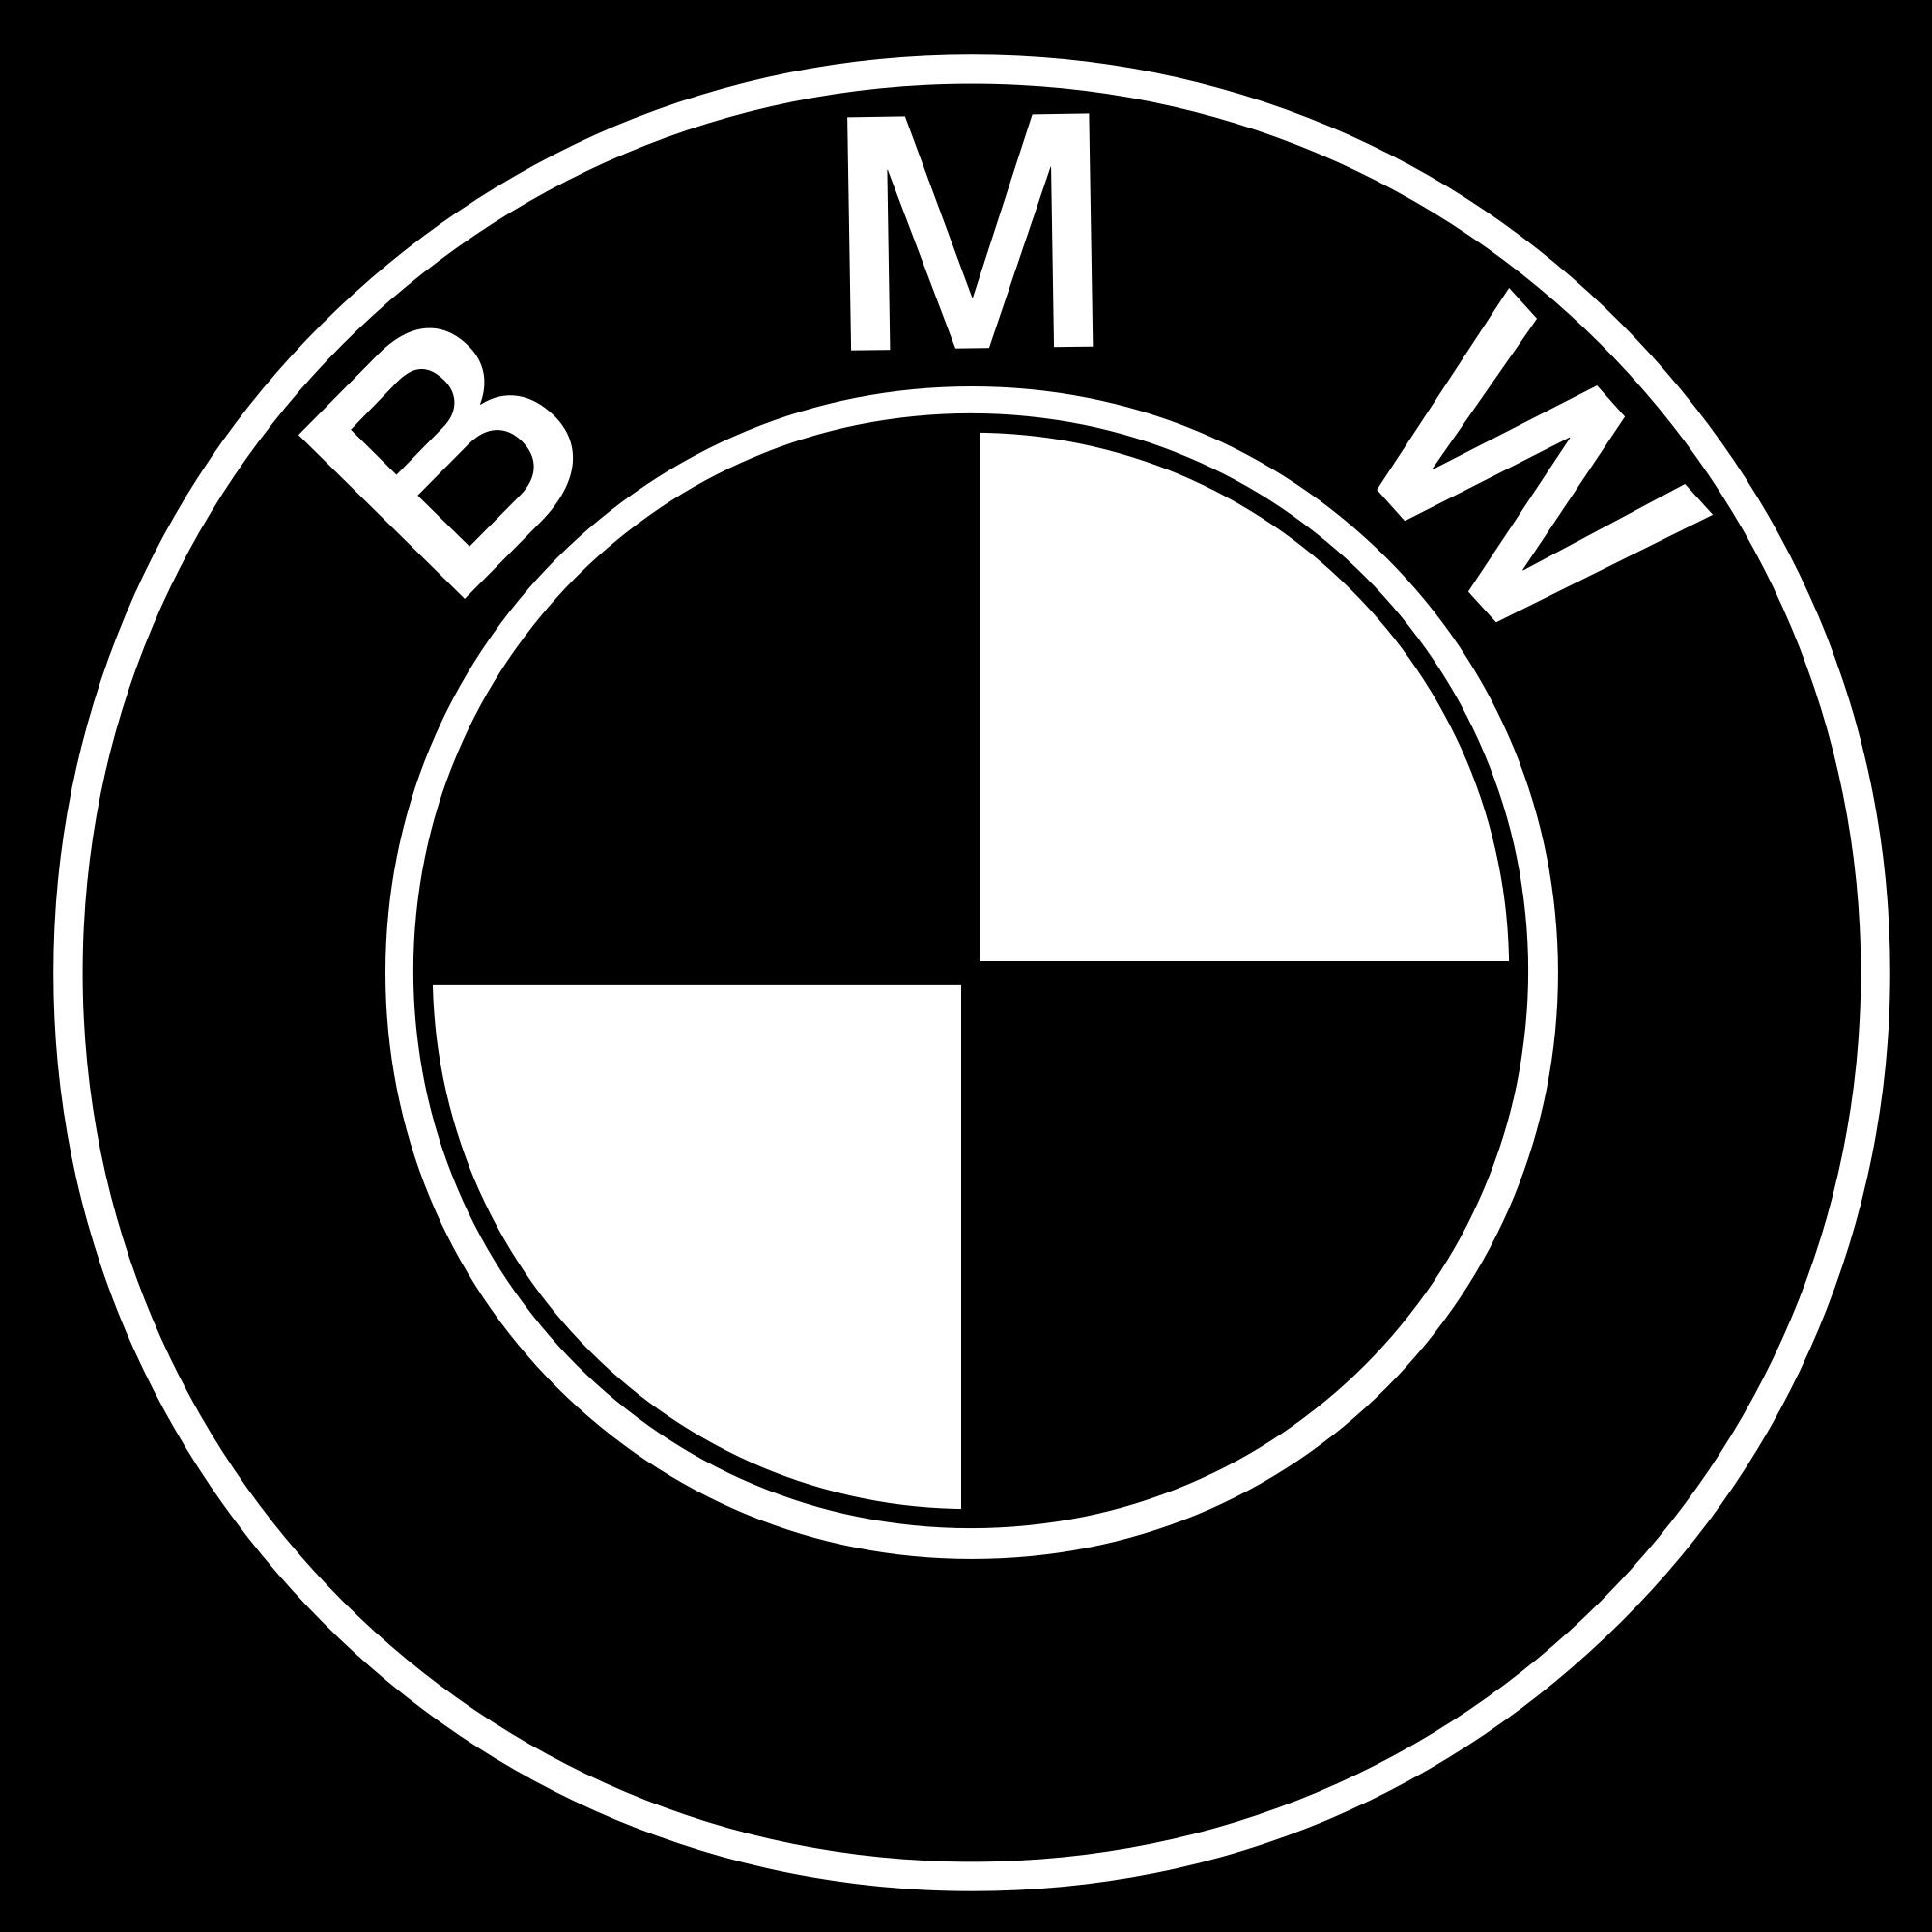 bmw logo decal Google Search Bmw logo, Bmw, Glasflaschen